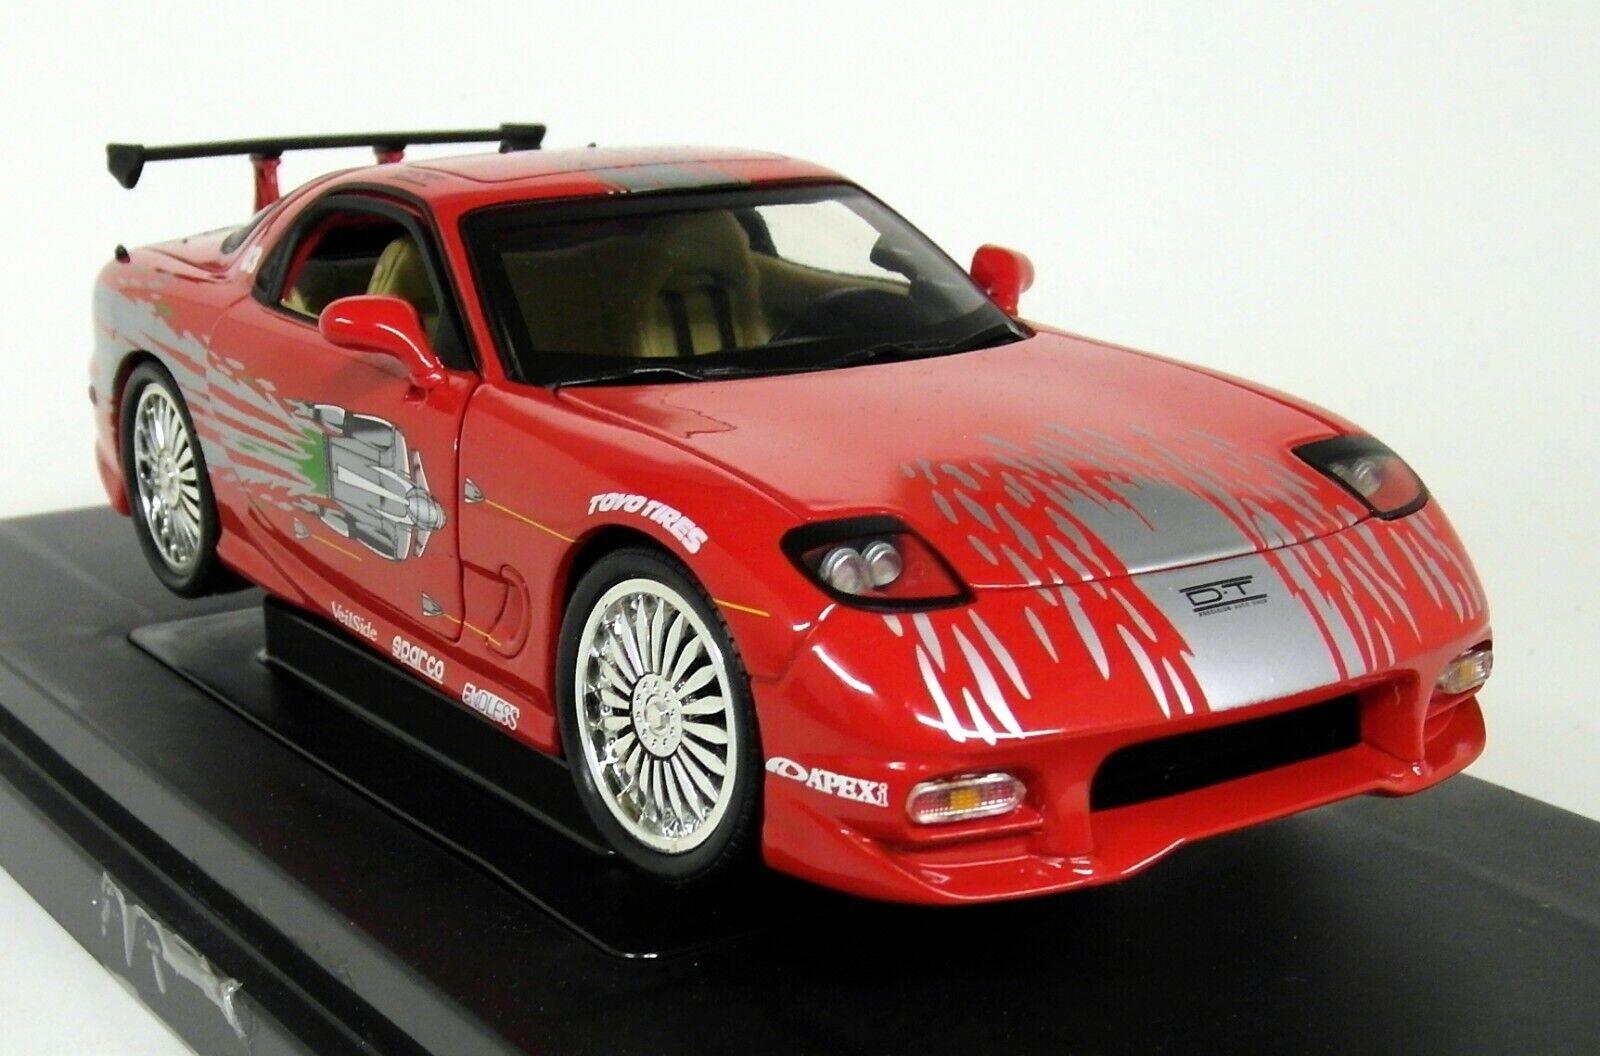 ERTL échelle 1 18 - Fast & Furious 36973 DOM'S MAZDA RX-7 1993 rouge Diecast Car